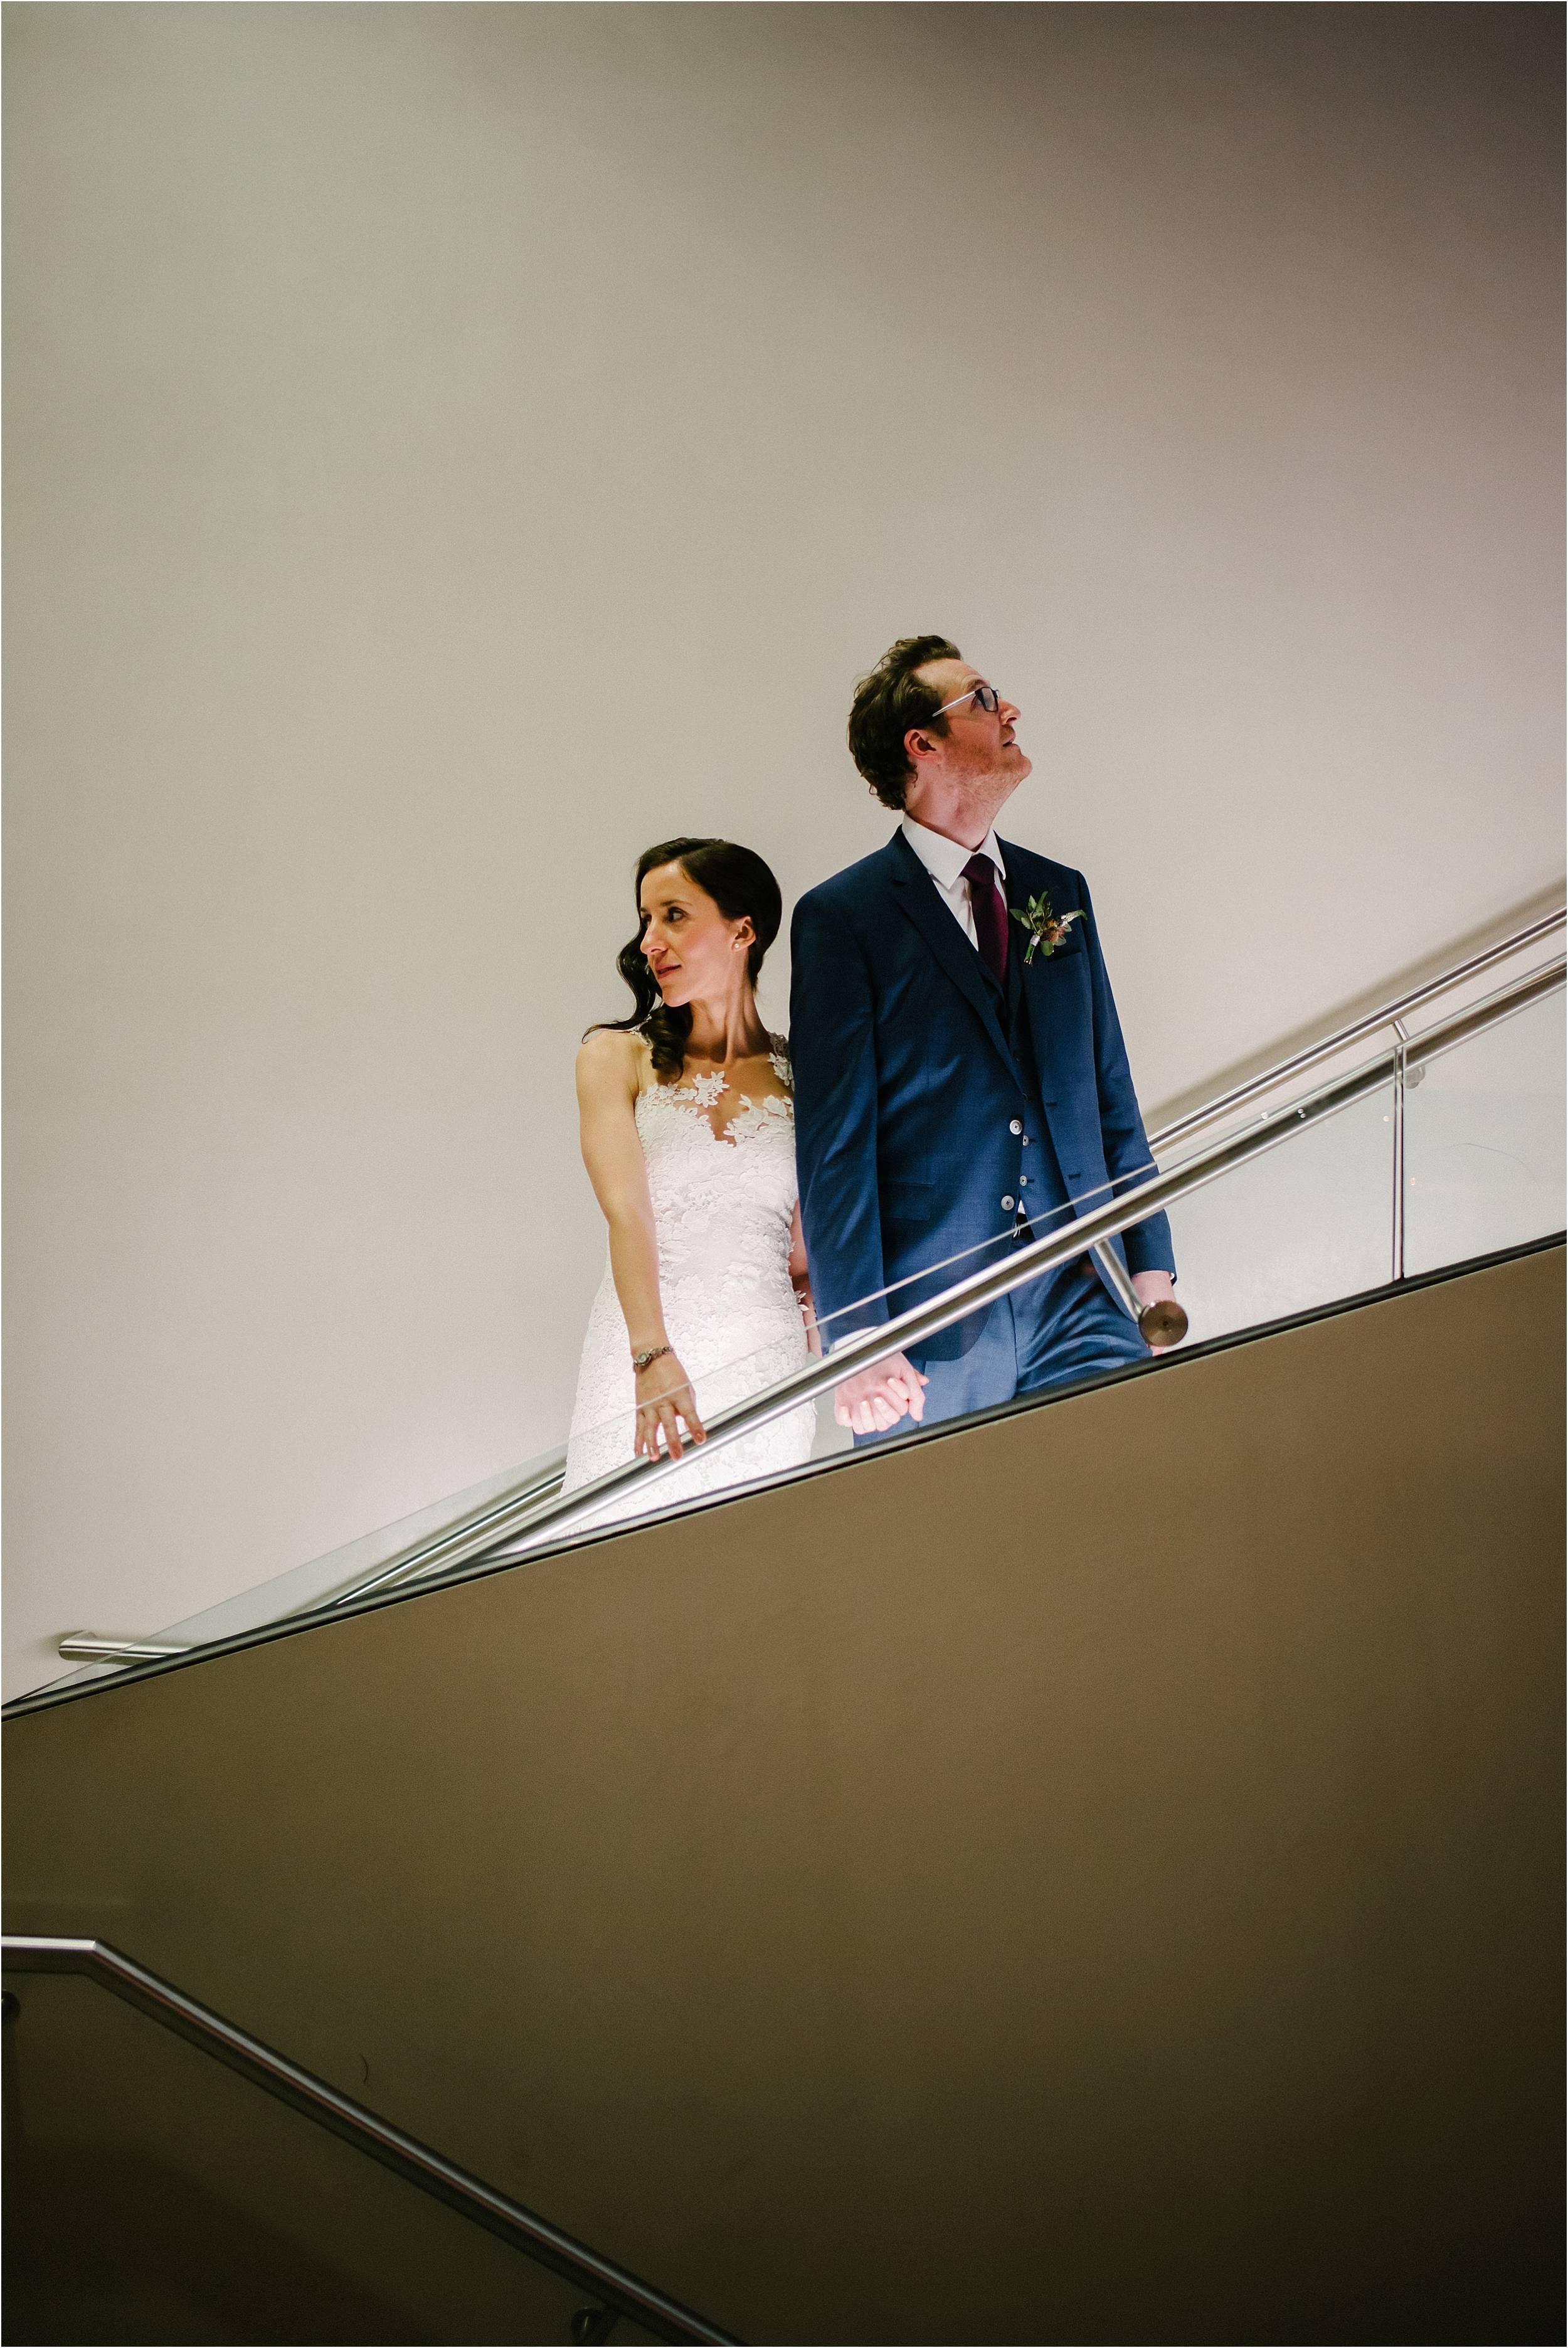 Oxford Ashmolean Museum Wedding Photography_0113.jpg